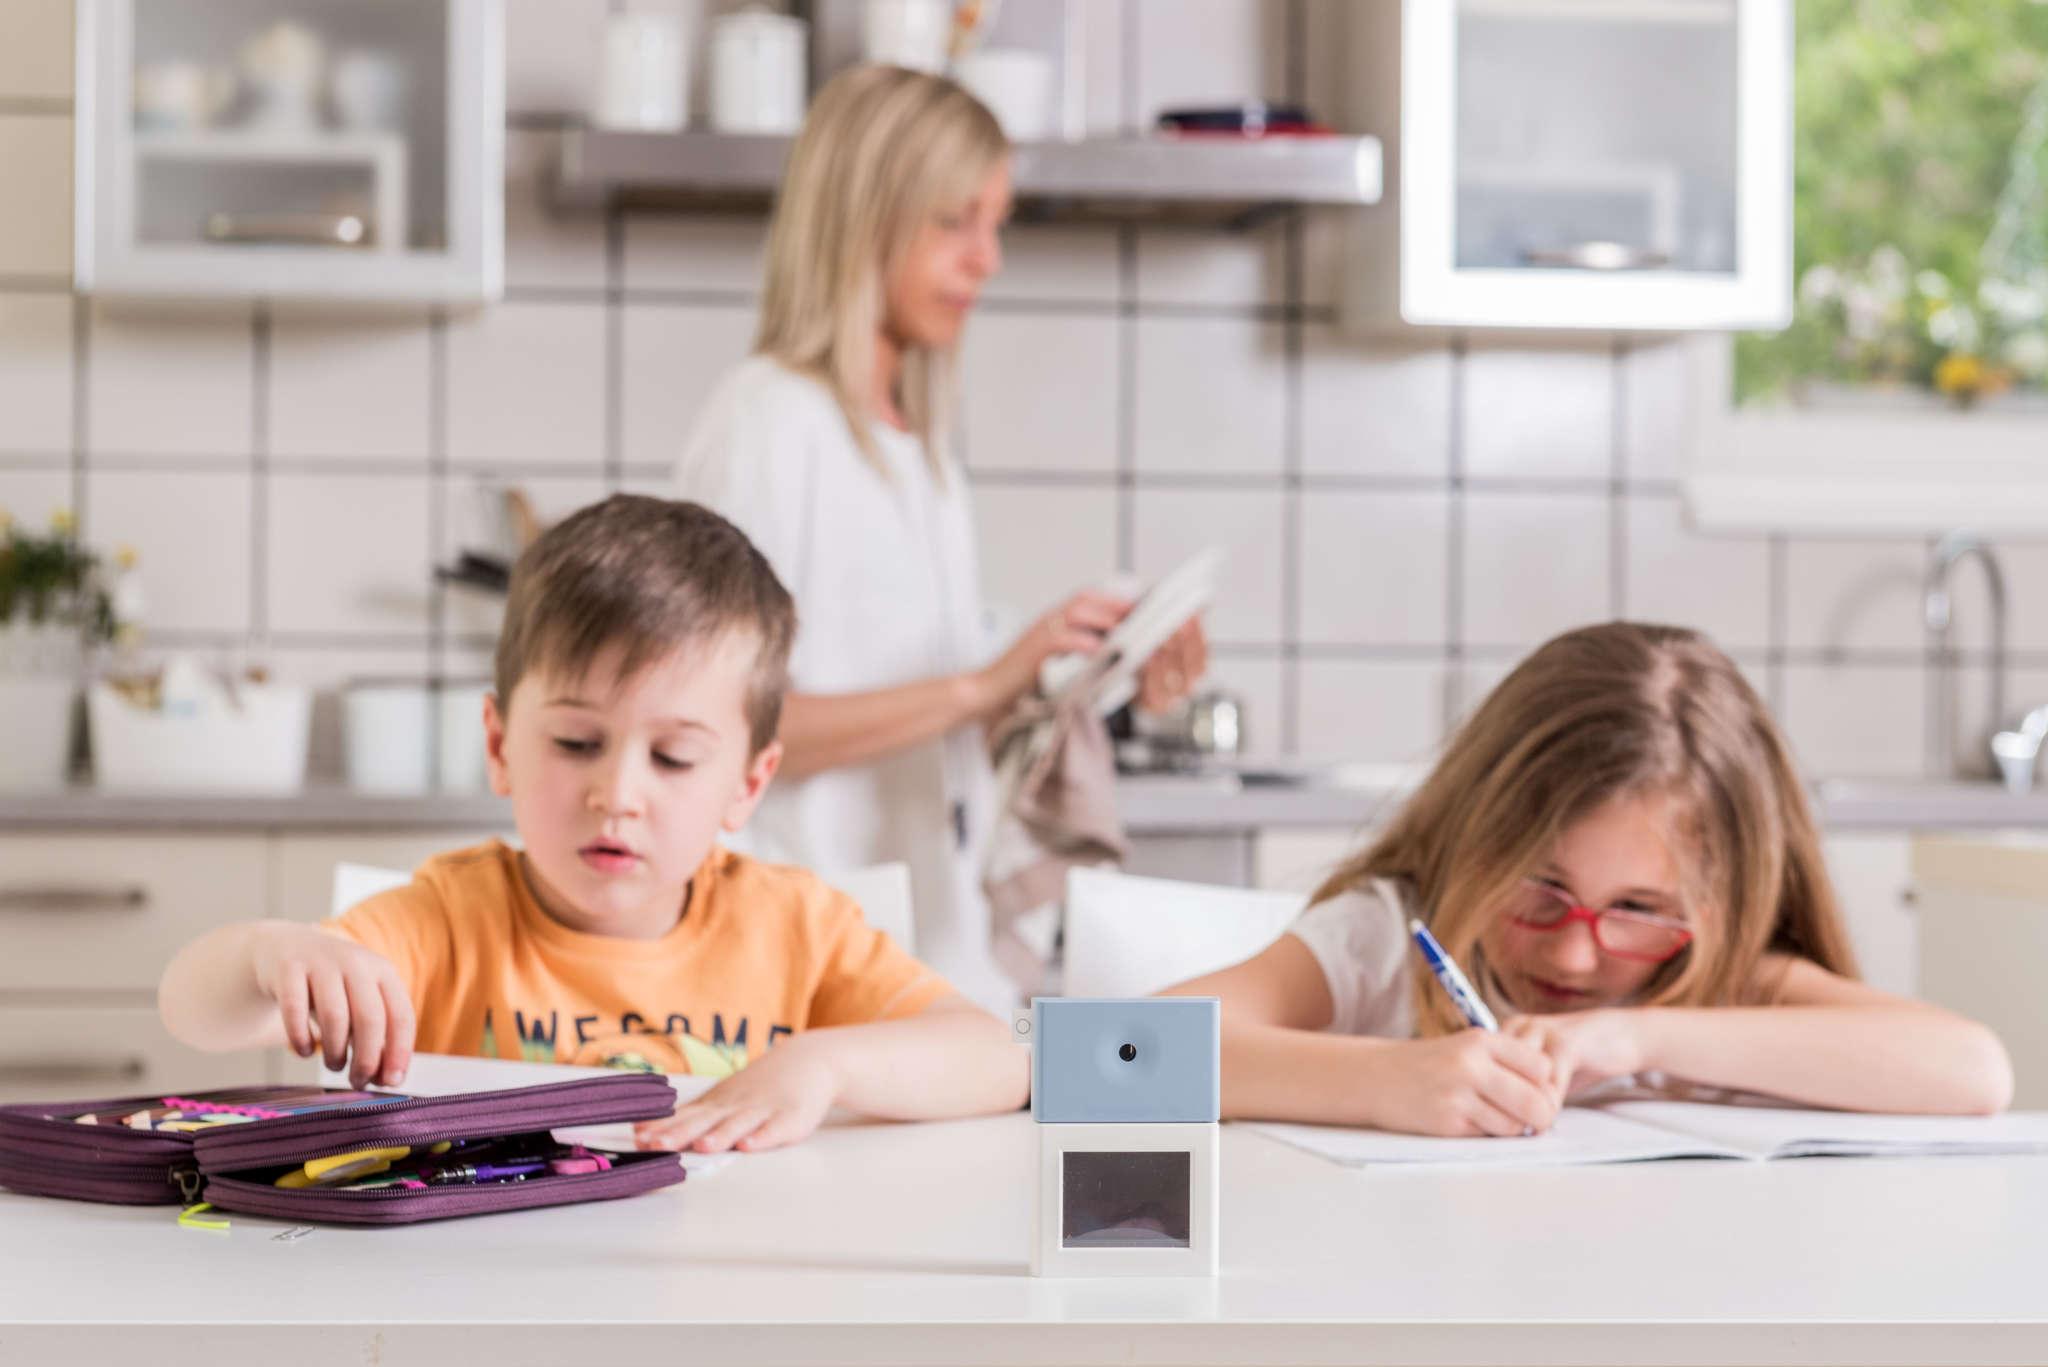 sensori upsens bambini studiano